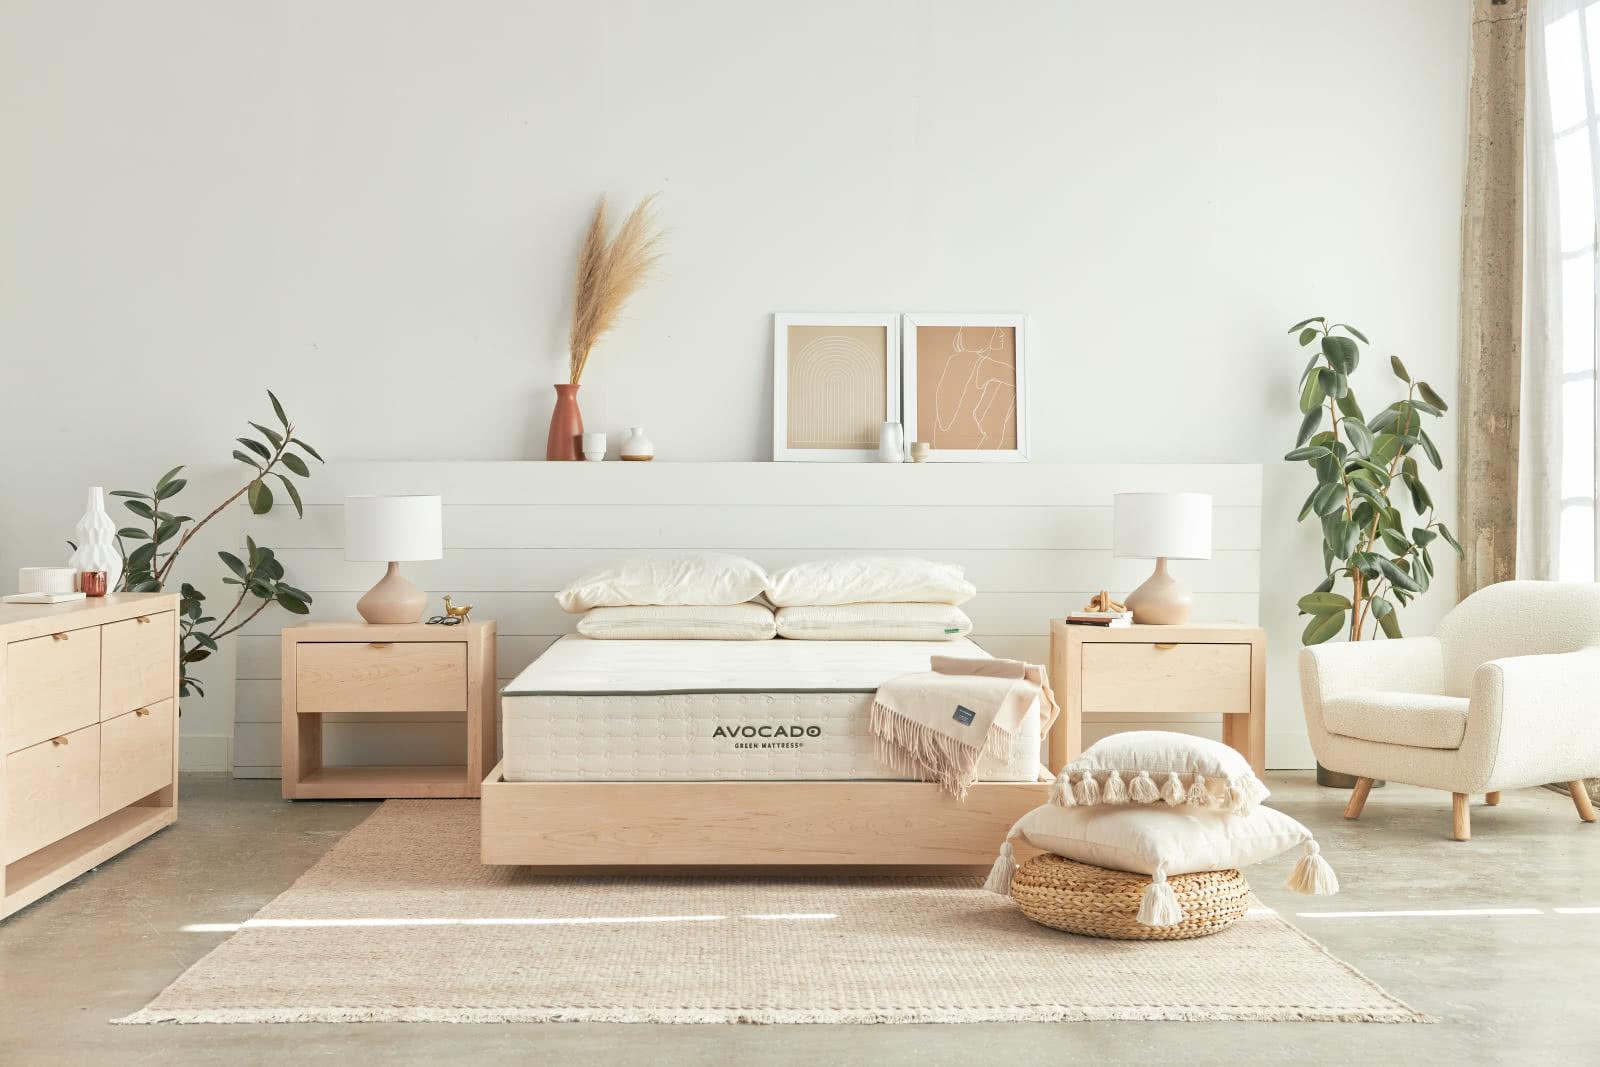 best luxury mattress brands avocado review luxe digital